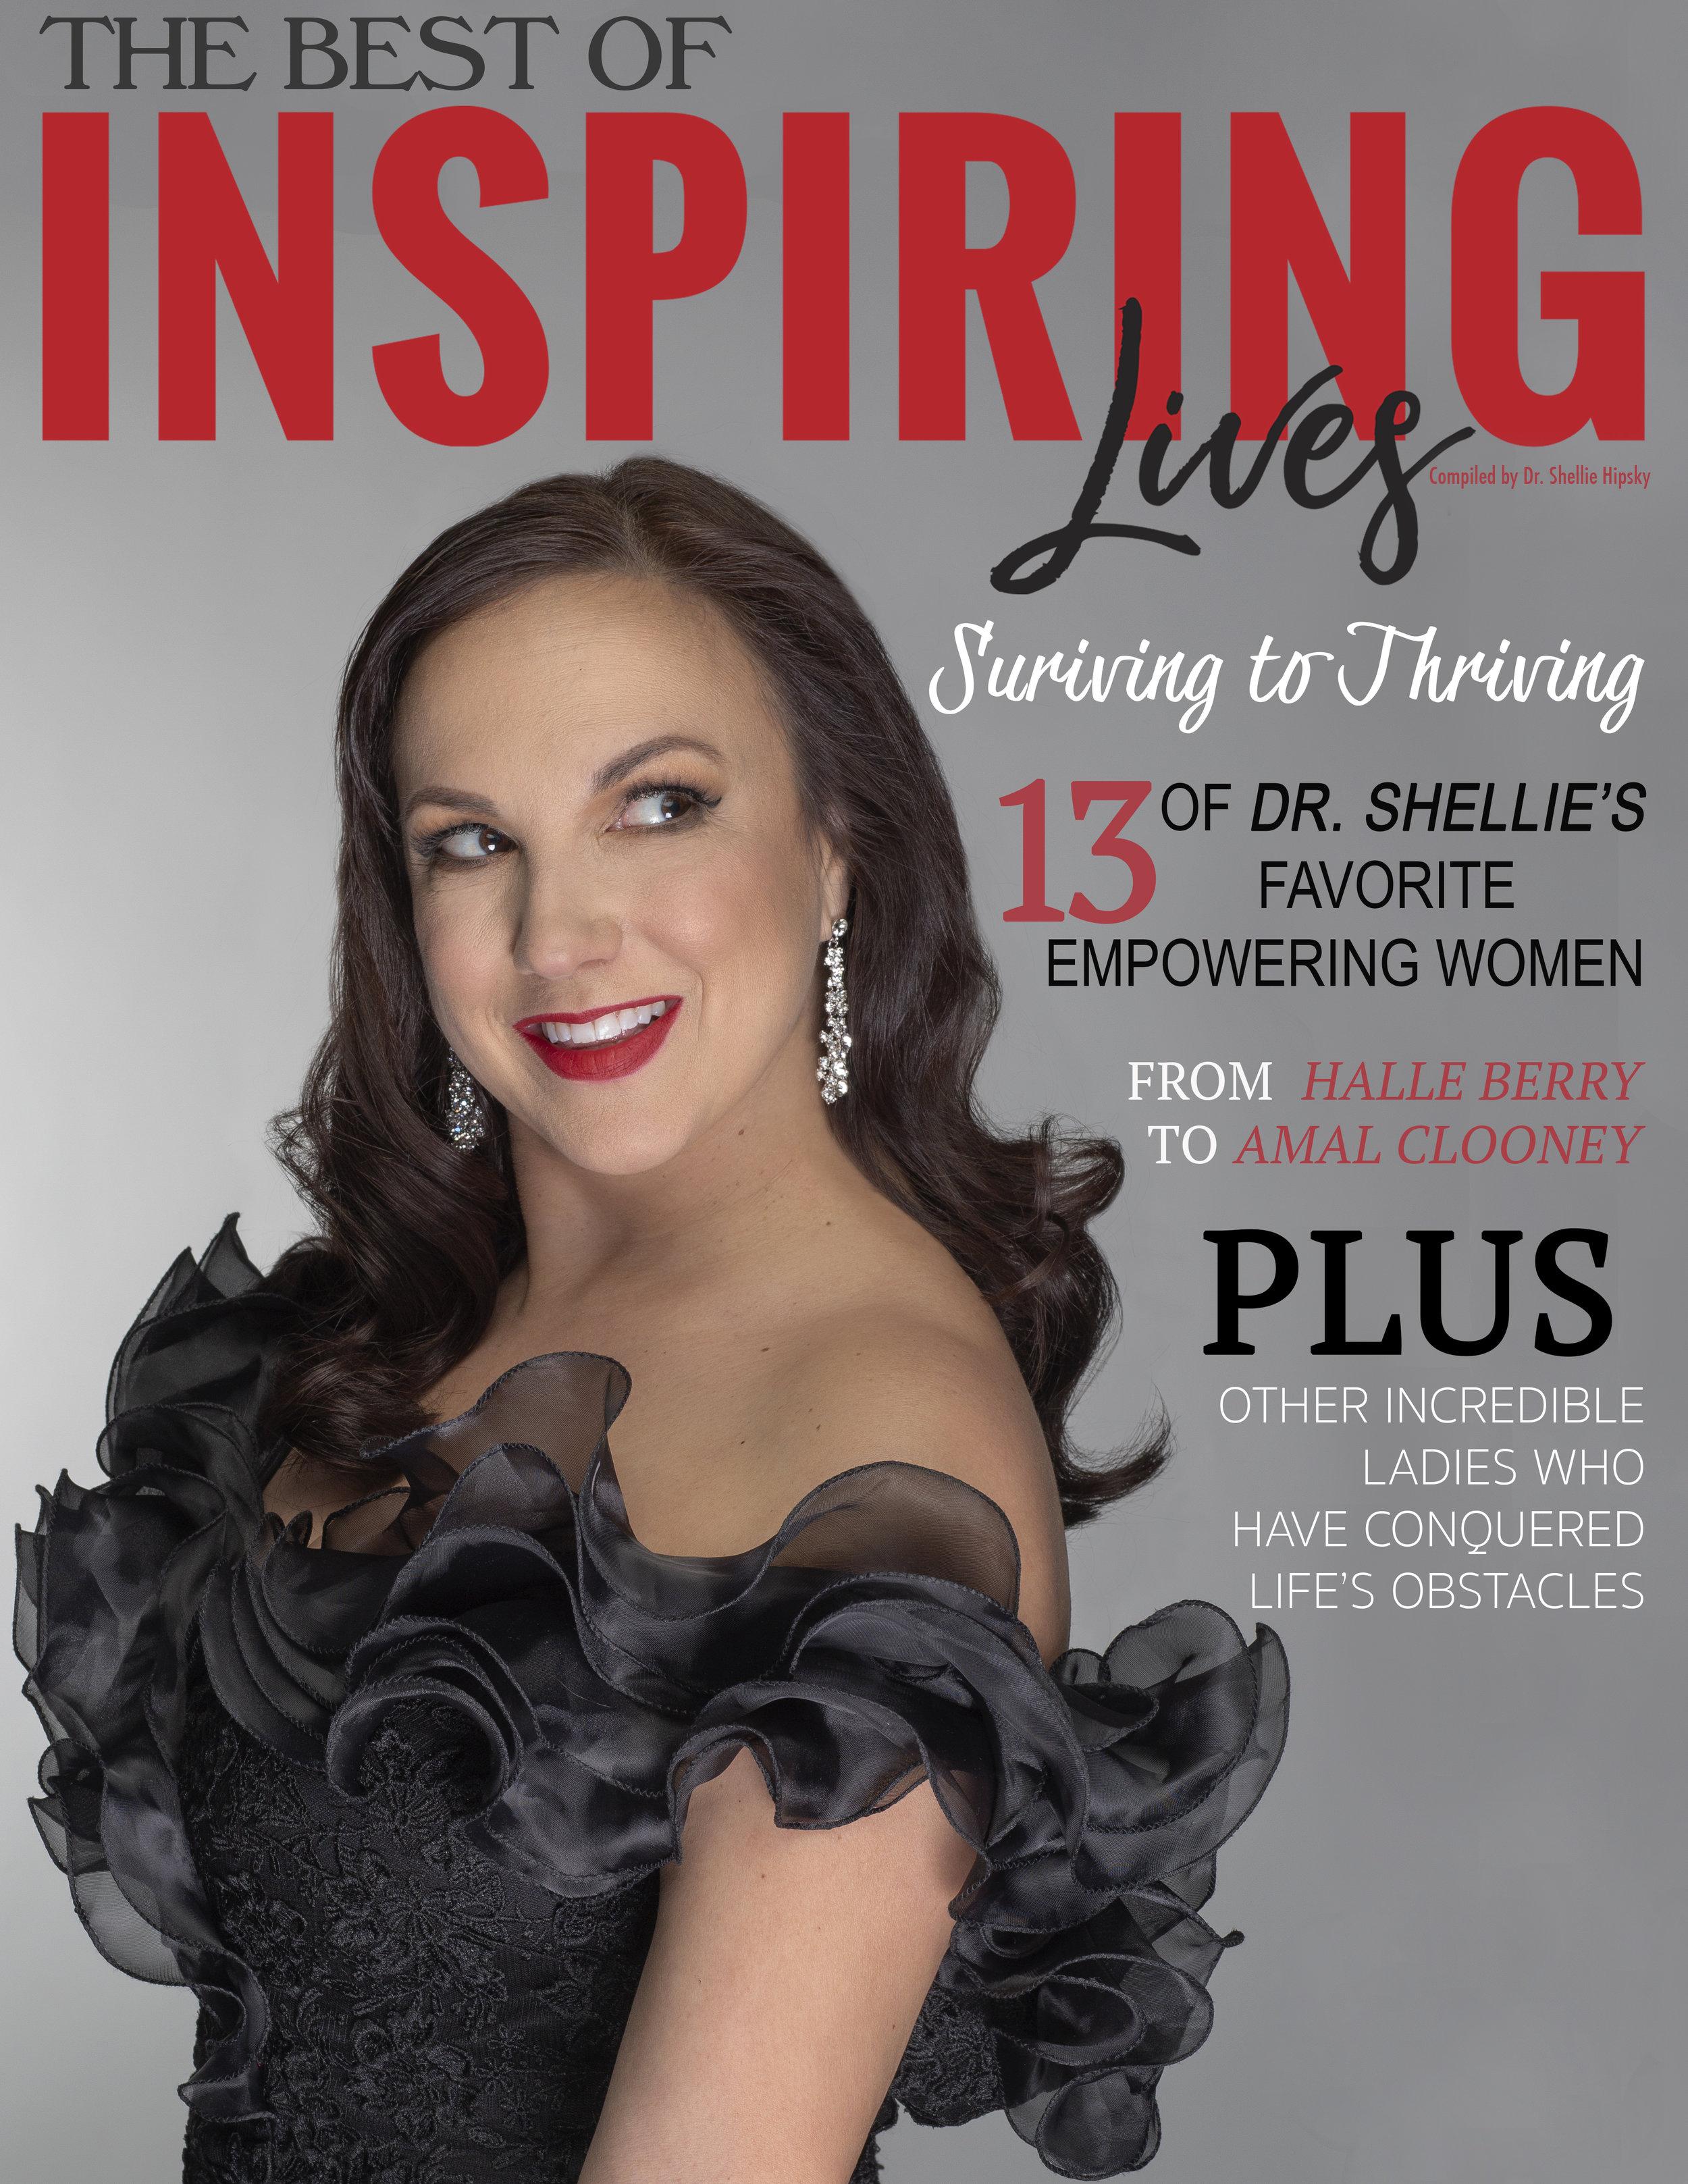 Dr. Shellie Hipsky - Empowering women across the world